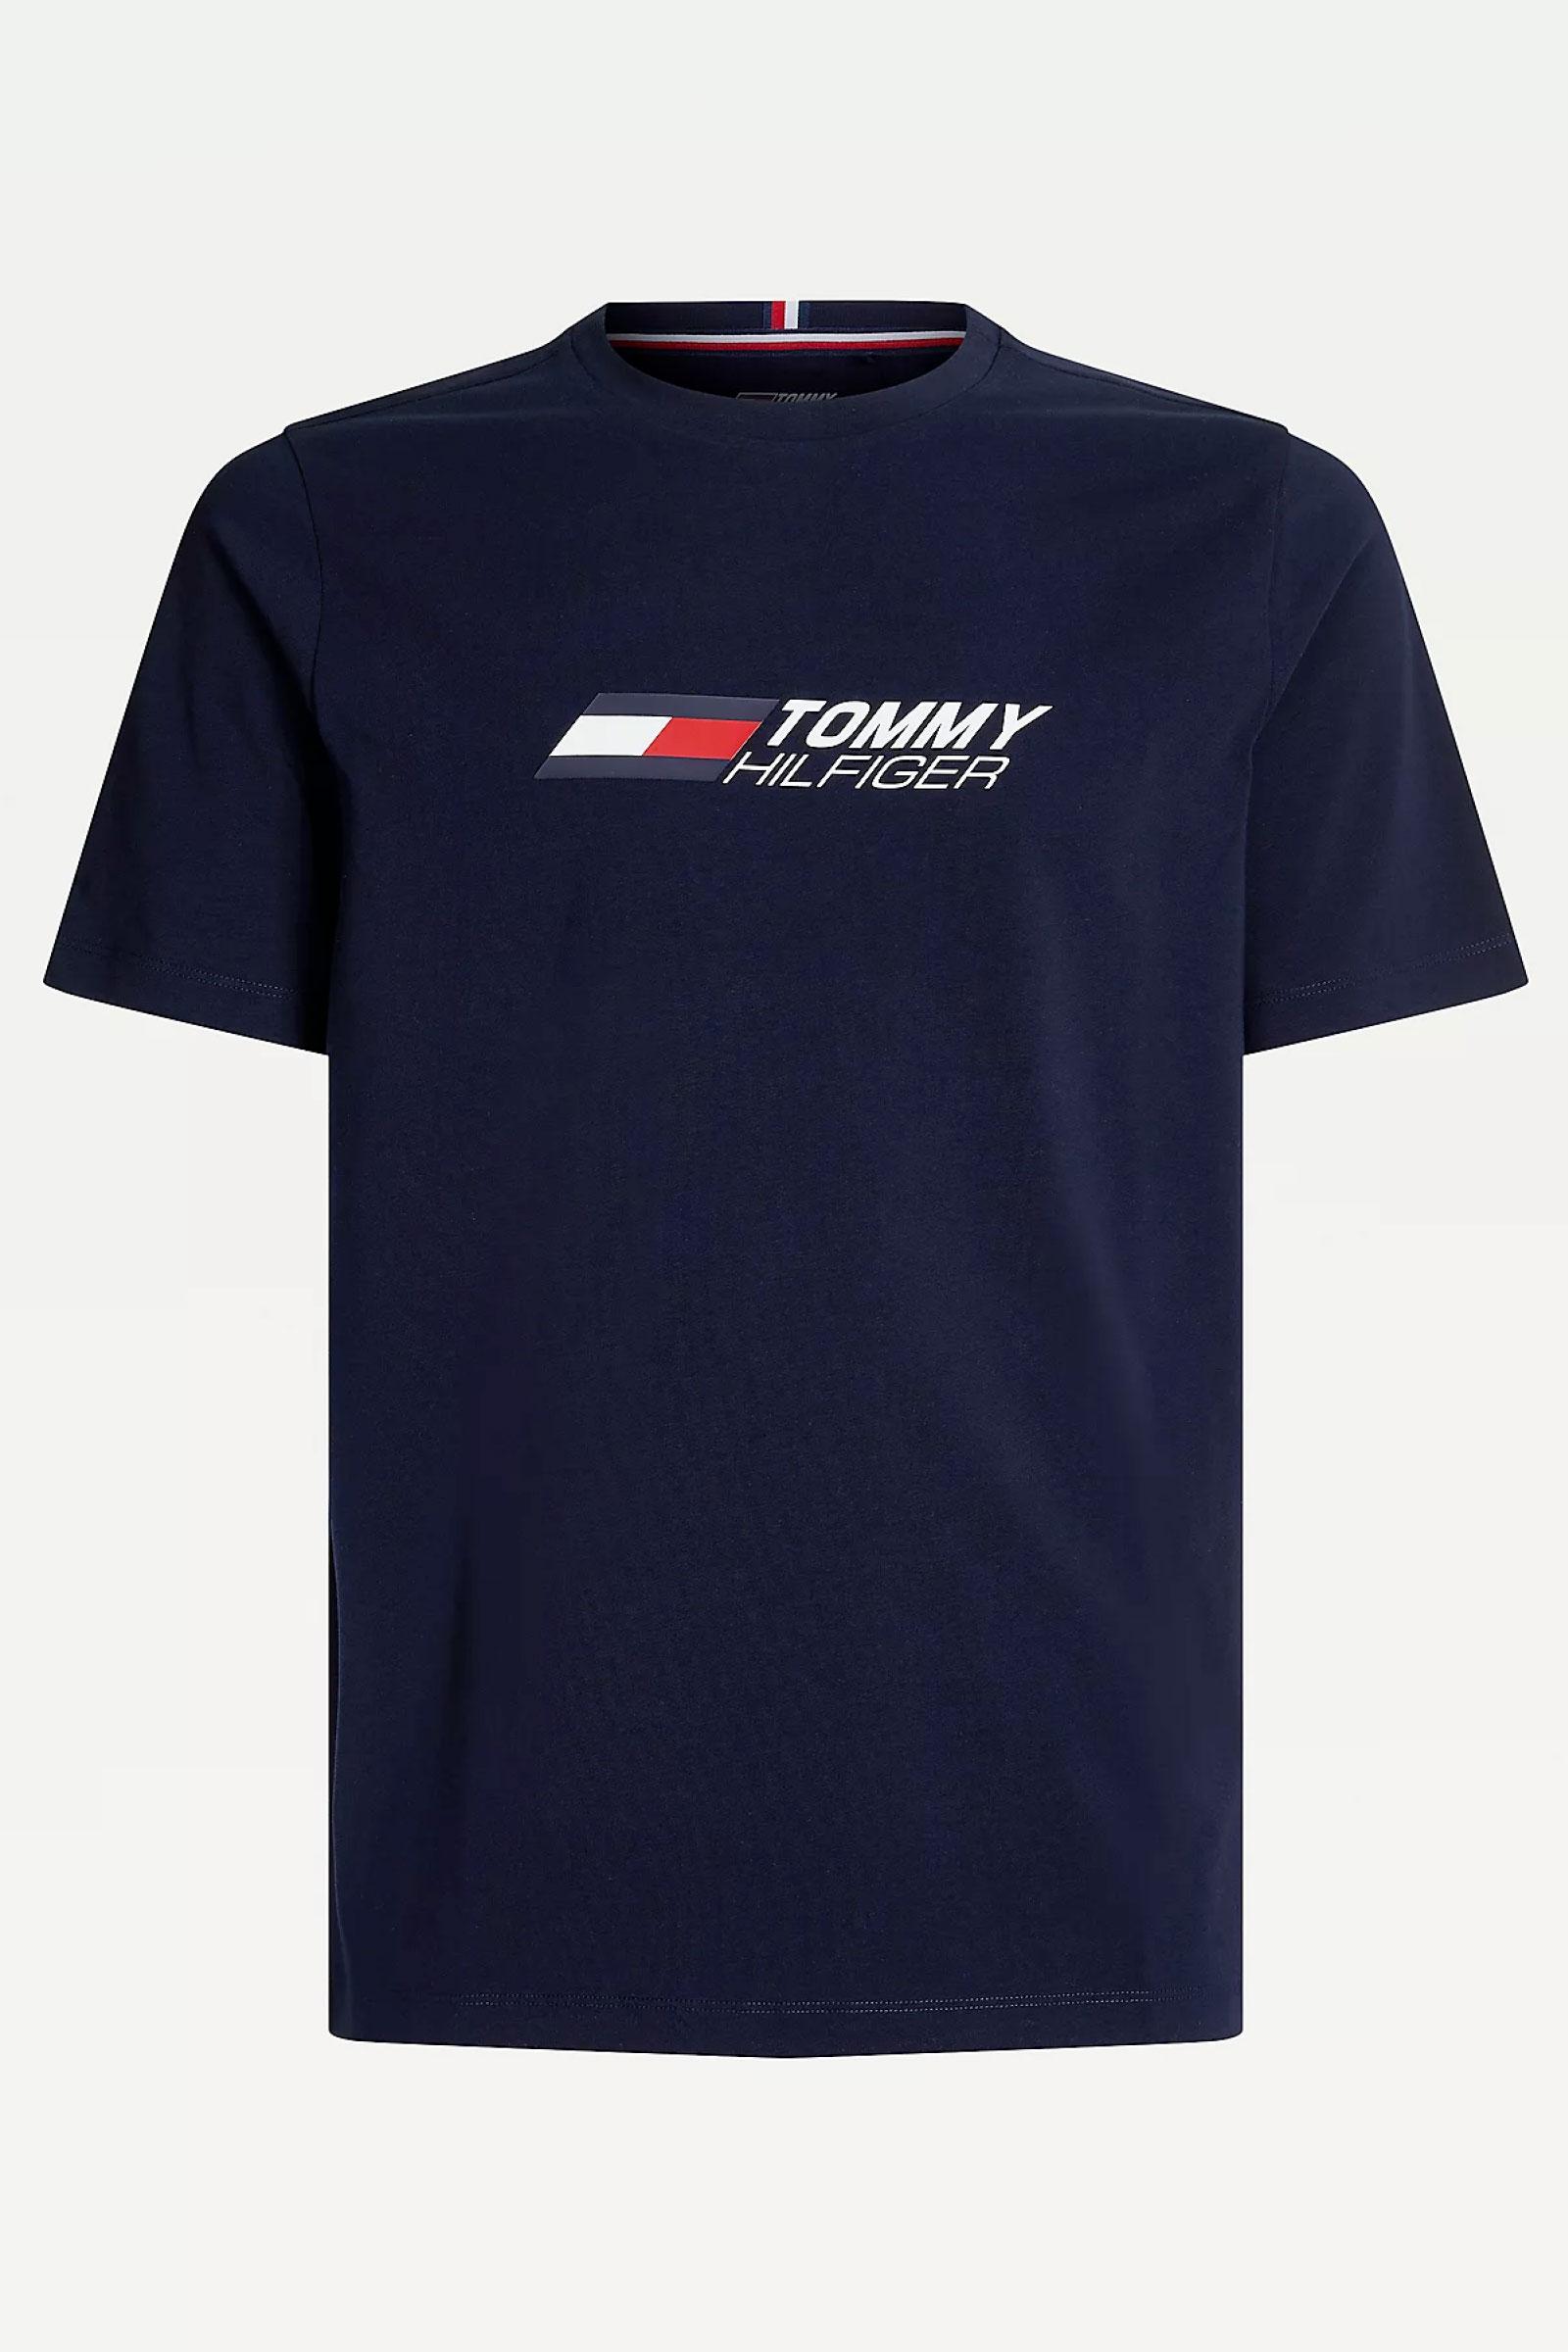 TOMMY HILFIGER T-Shirt Uomo TOMMY HILFIGER   T-Shirt   MW0MW17282DW5